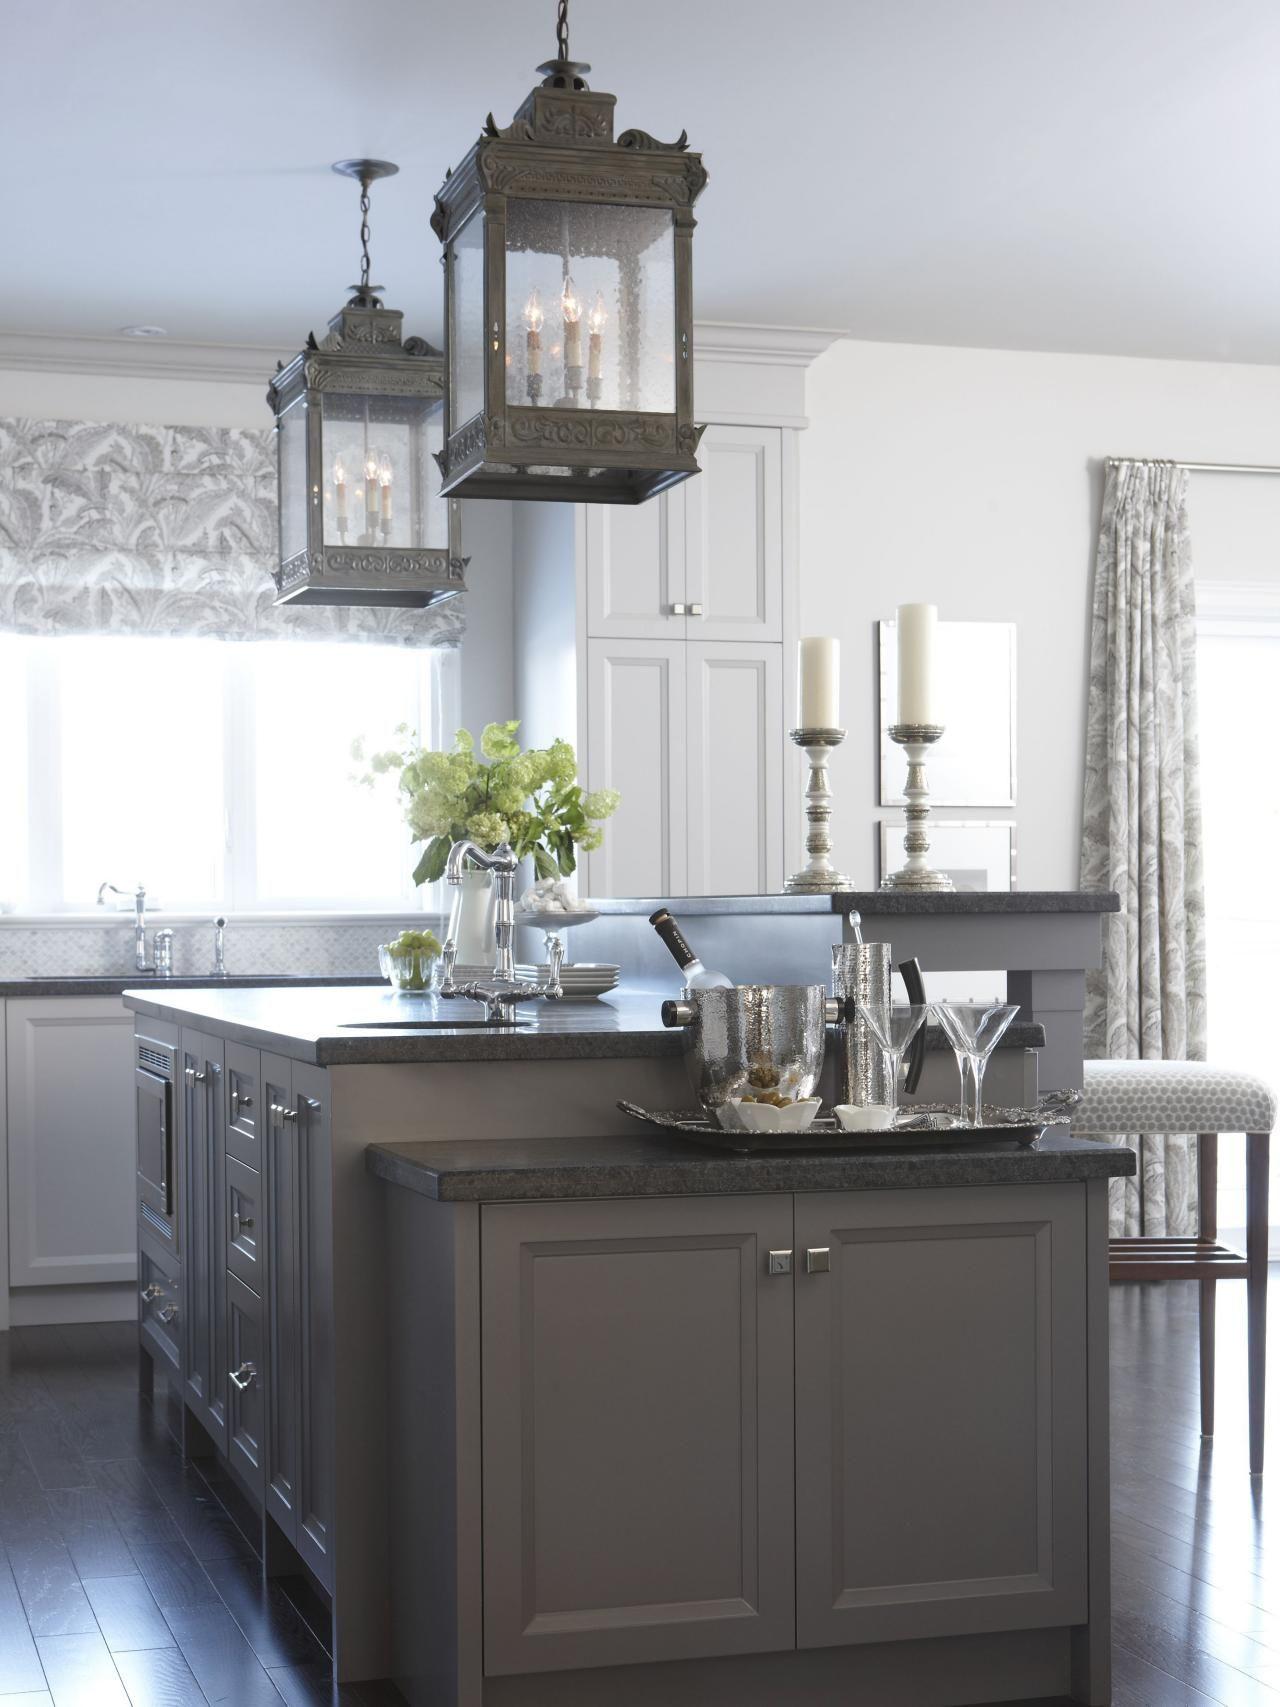 Beautiful Pictures of Kitchen Islands: HGTV\'s Favorite Design Ideas ...